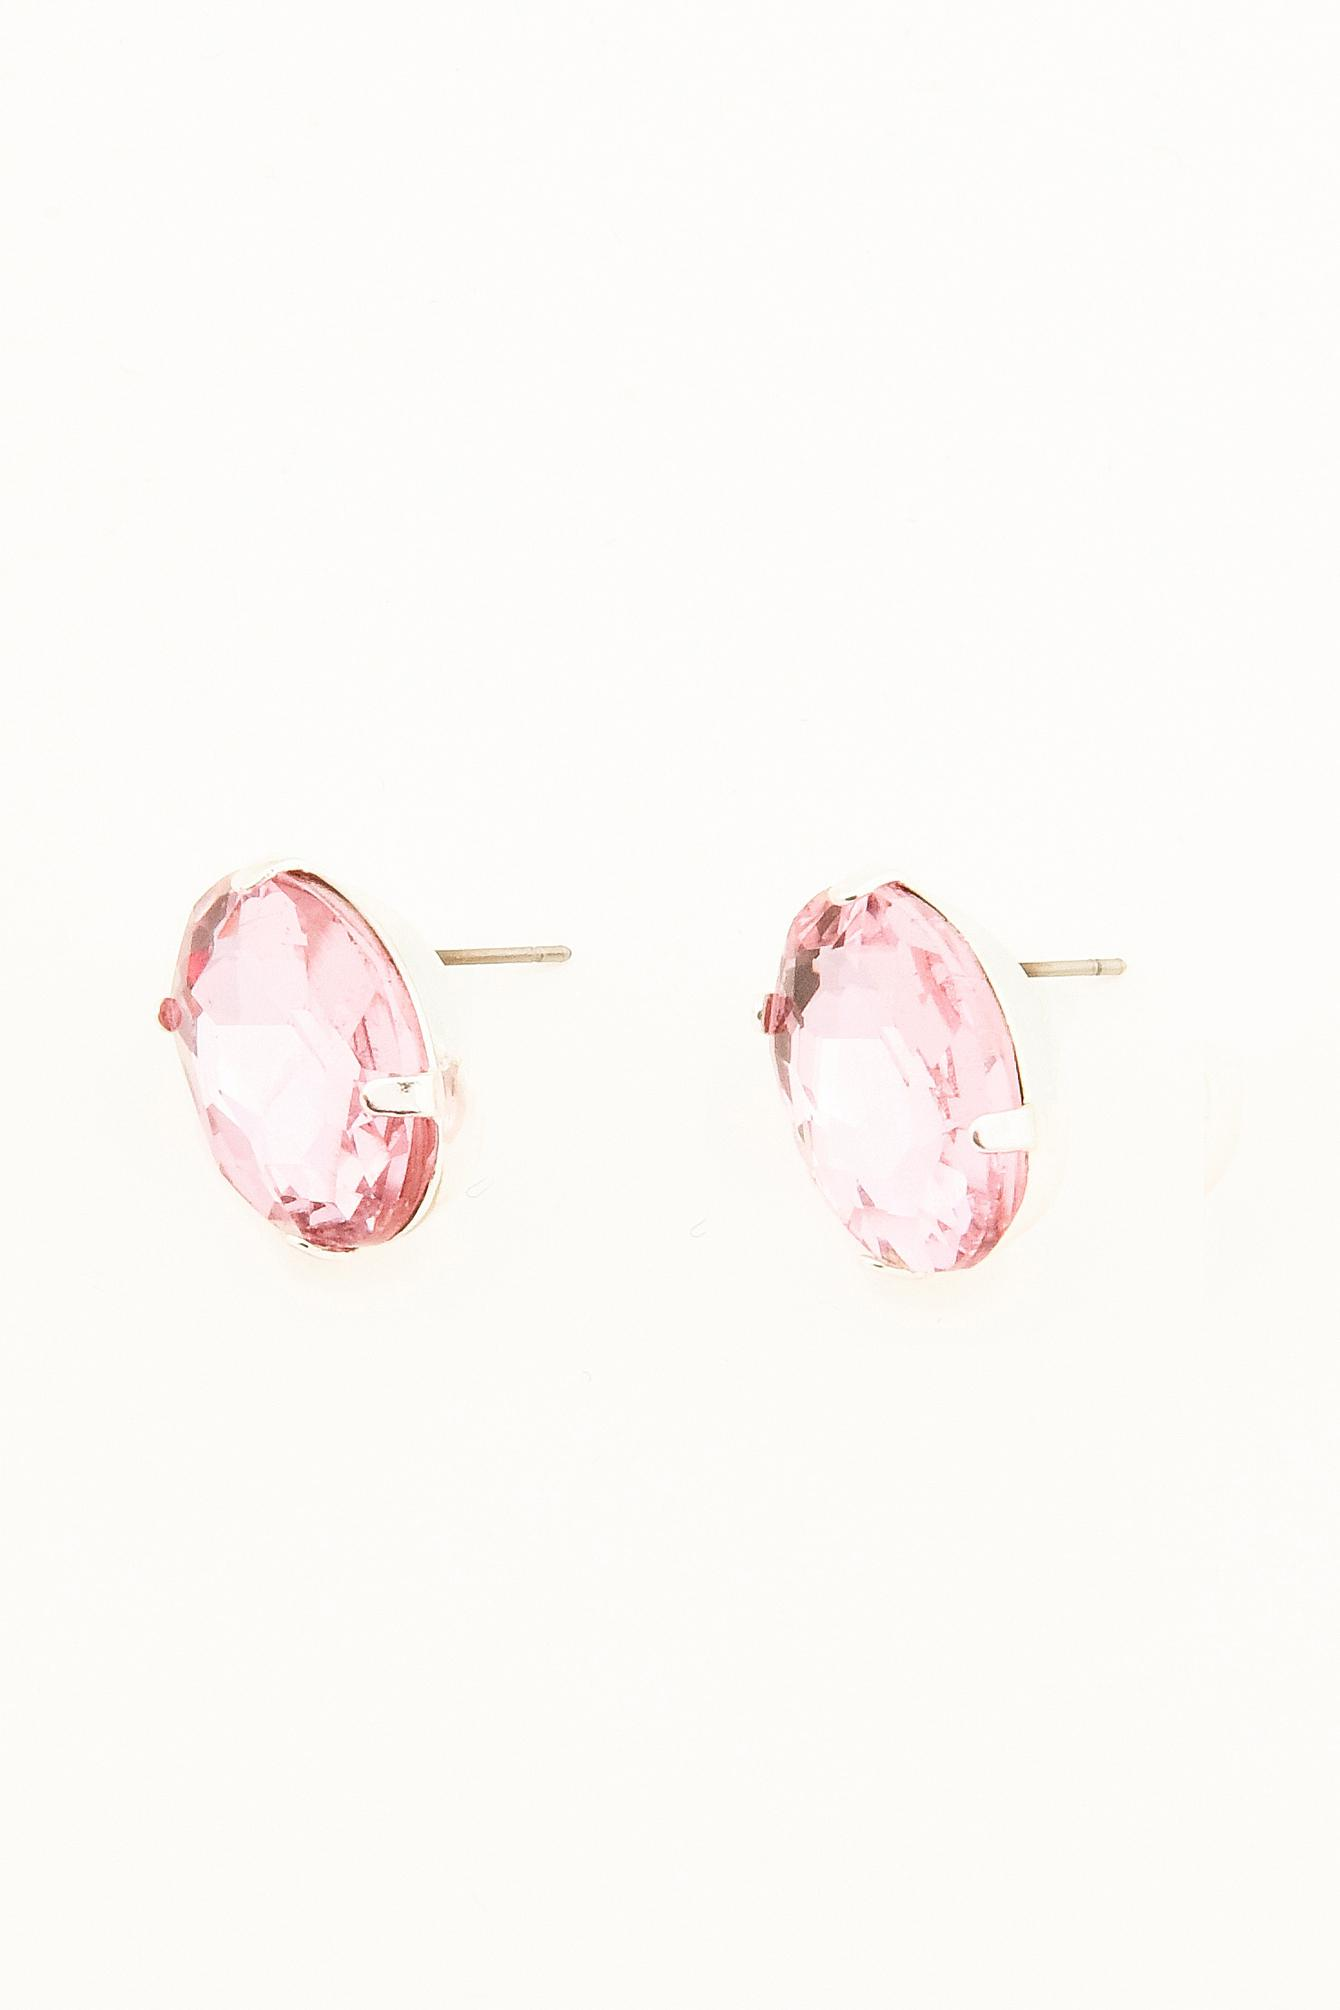 NA-KD Colored Diamond Earrring Light Pink